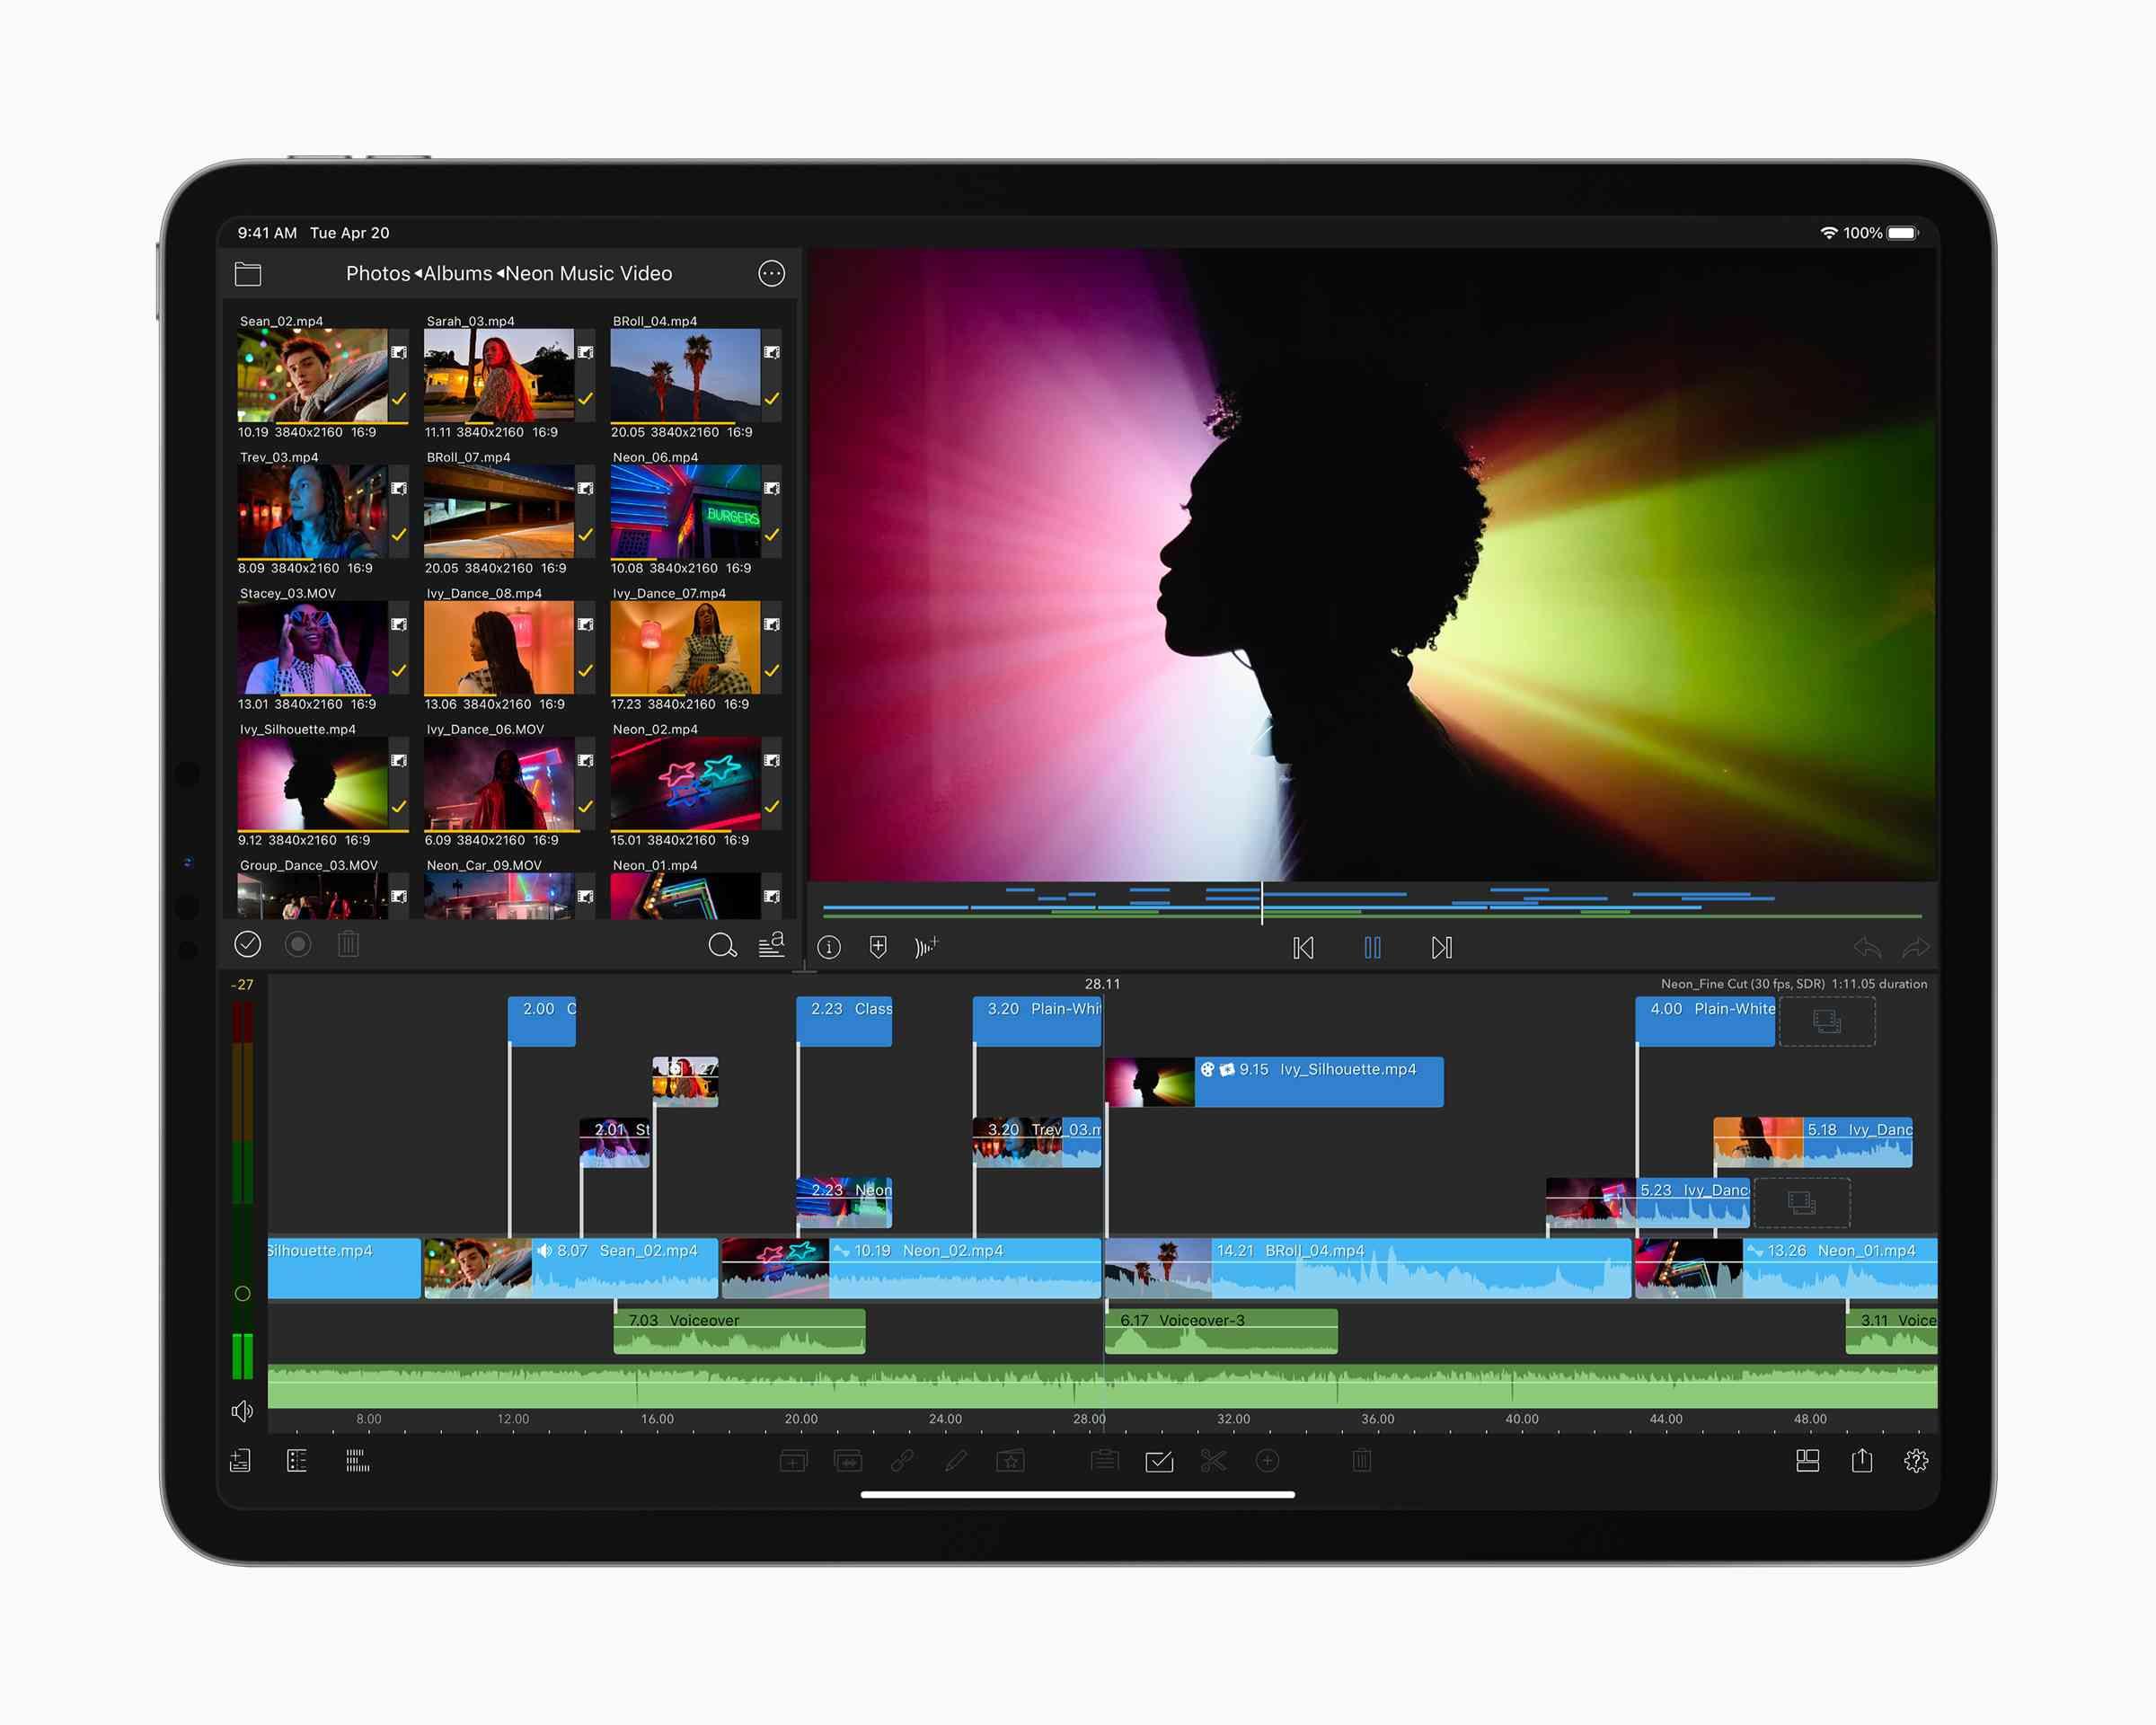 M1 iPad Pro running the LumaFusion video editing app